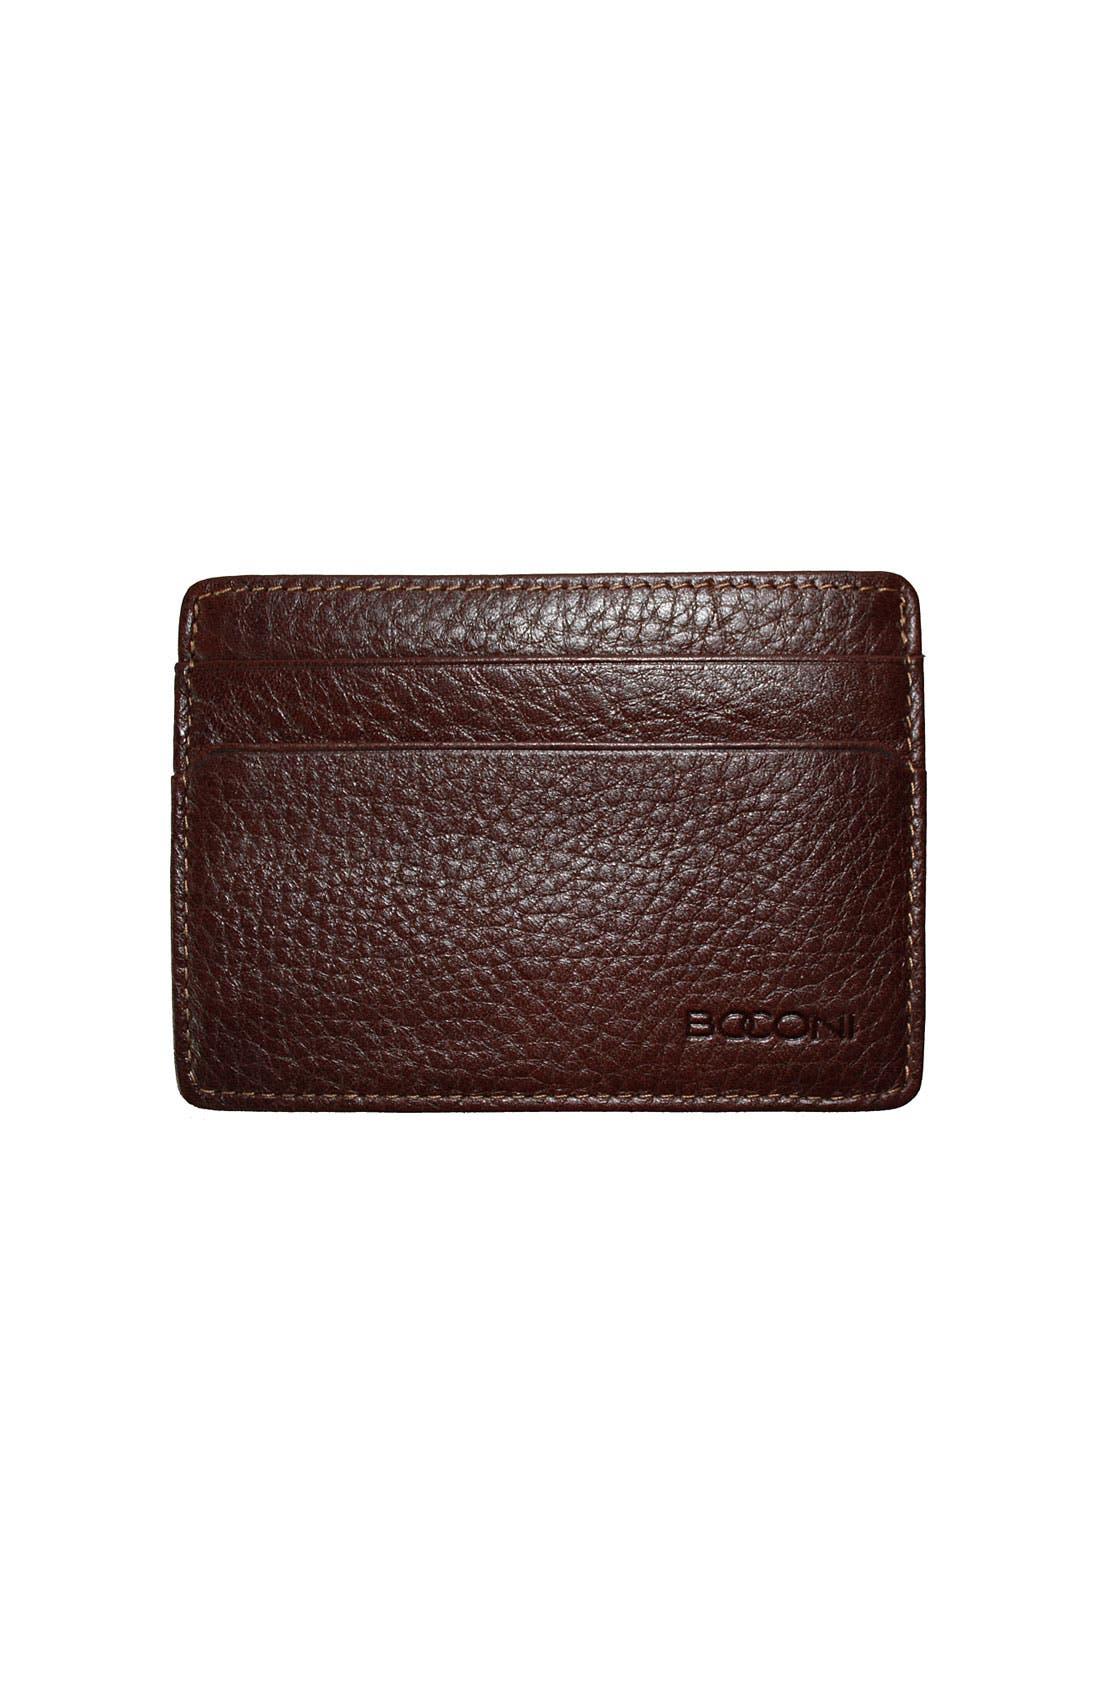 Alternate Image 1 Selected - Boconi 'Tyler' Tumbled Leather ID Card Case